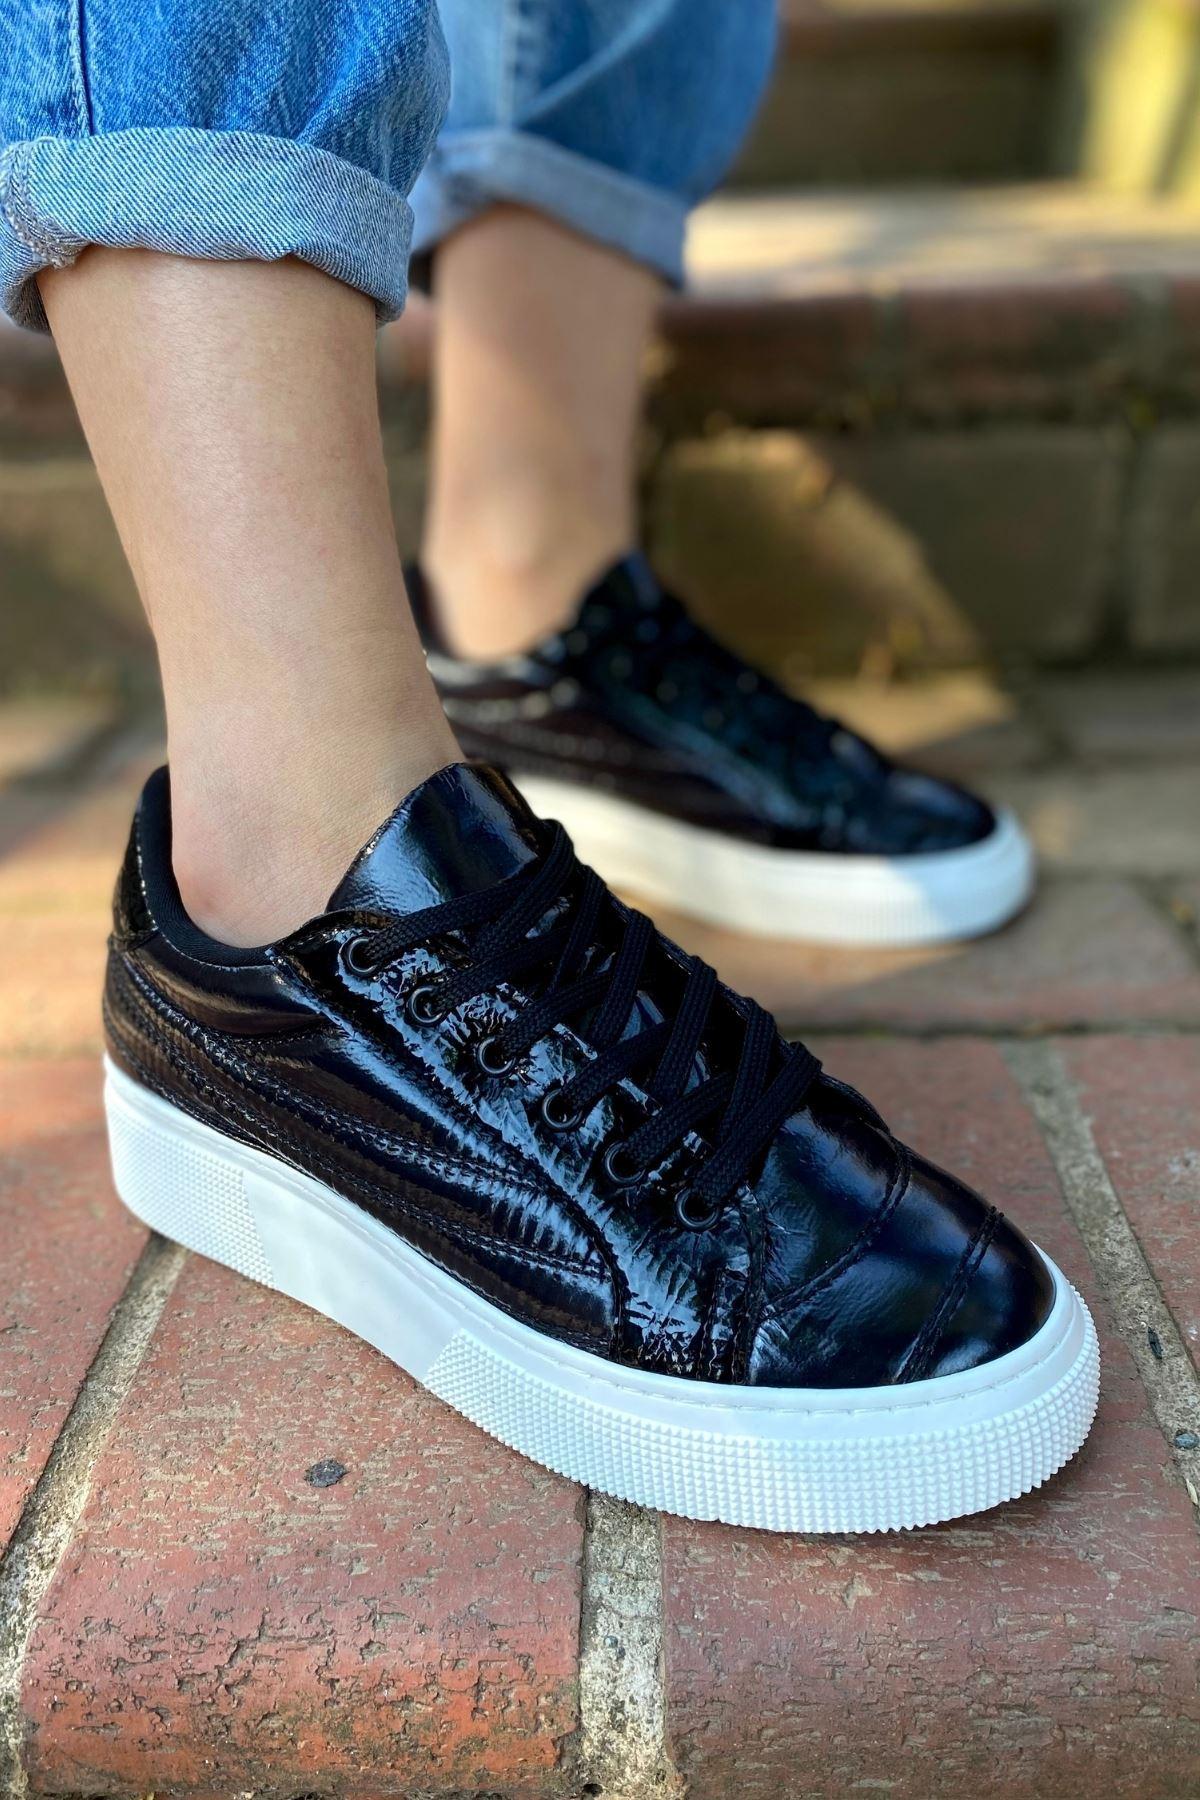 Zendo Siyah Paraşüt Kapitone Sneaker